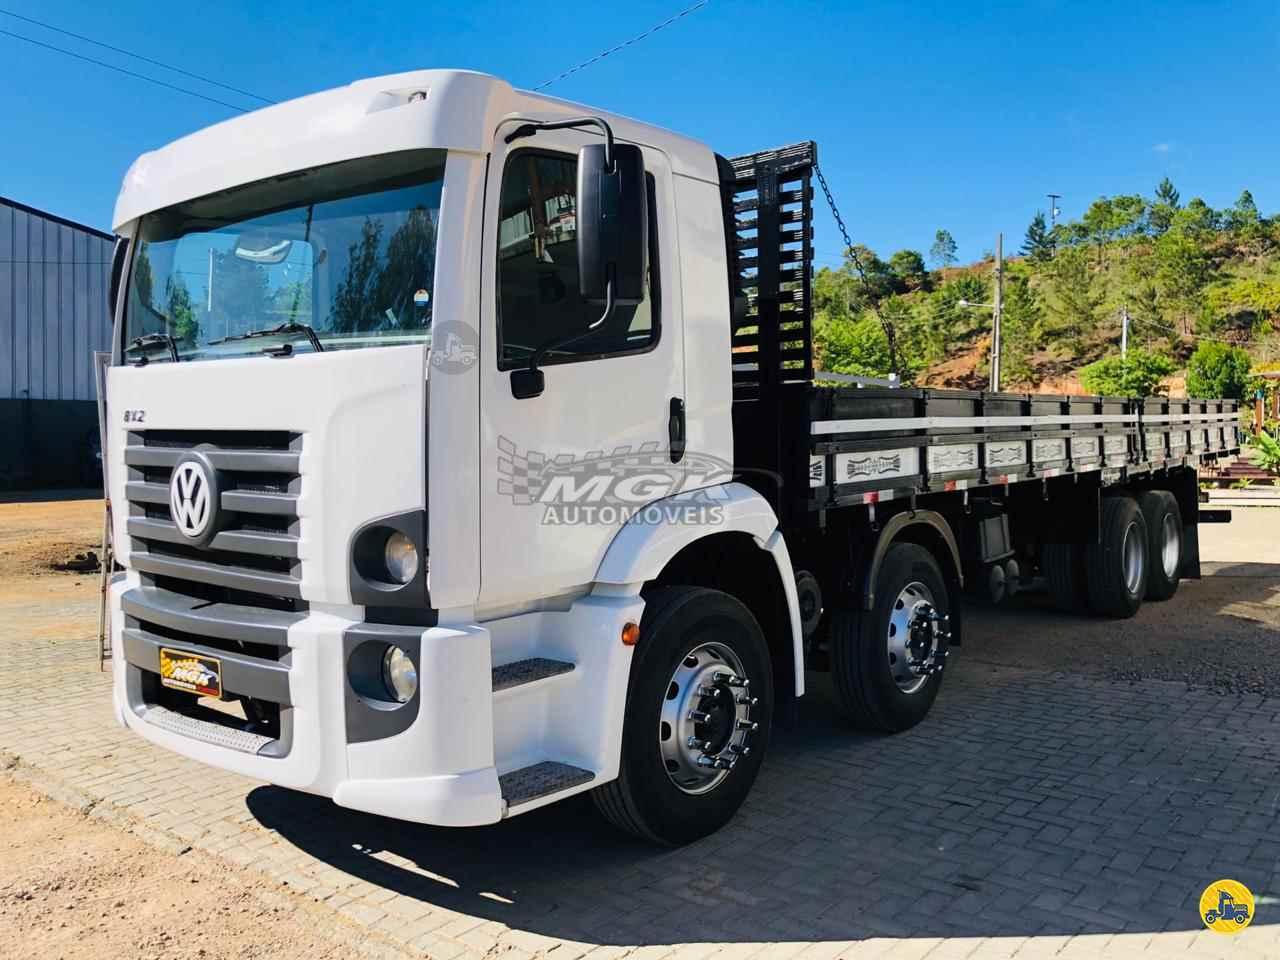 VOLKSWAGEN VW 24250 100000km 2010/2010 MGK Automóveis